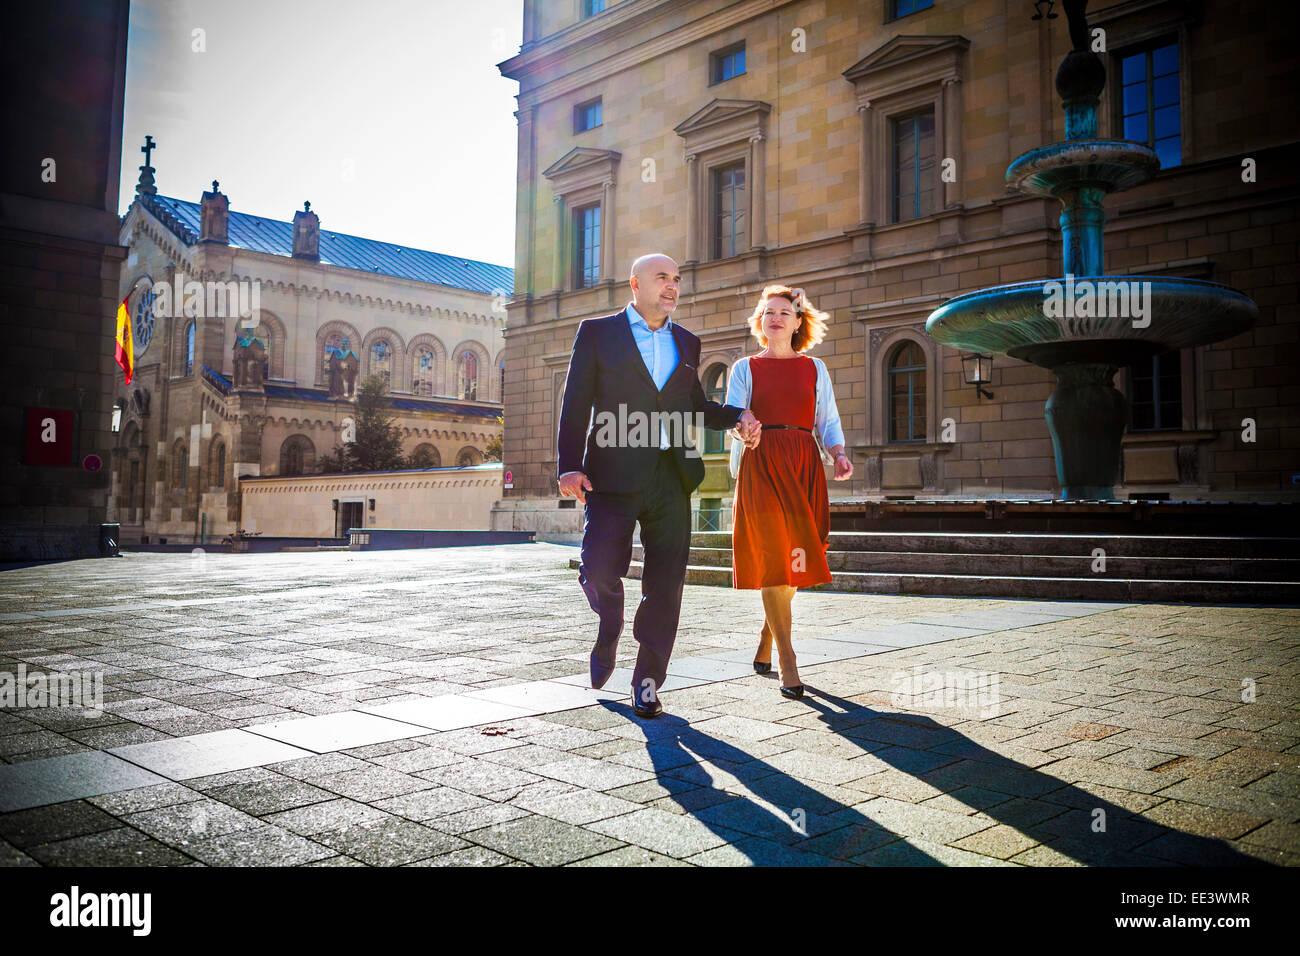 Senior couple walking in town, Munich, Bavaria, Germany Stock Photo